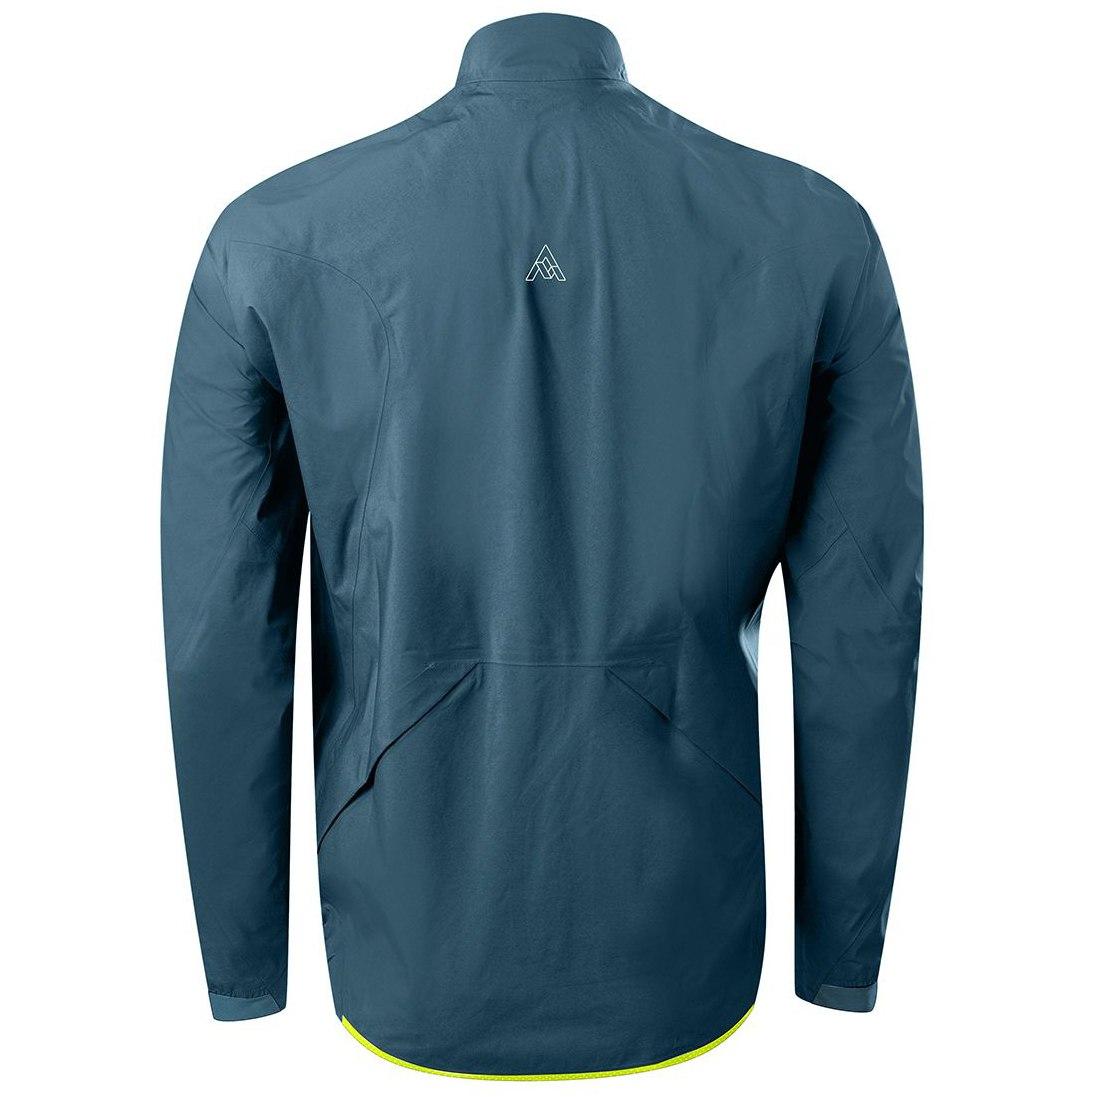 Imagen de 7mesh Rebellion Jacket Chaqueta impermeable para hombres - Mallard Blue